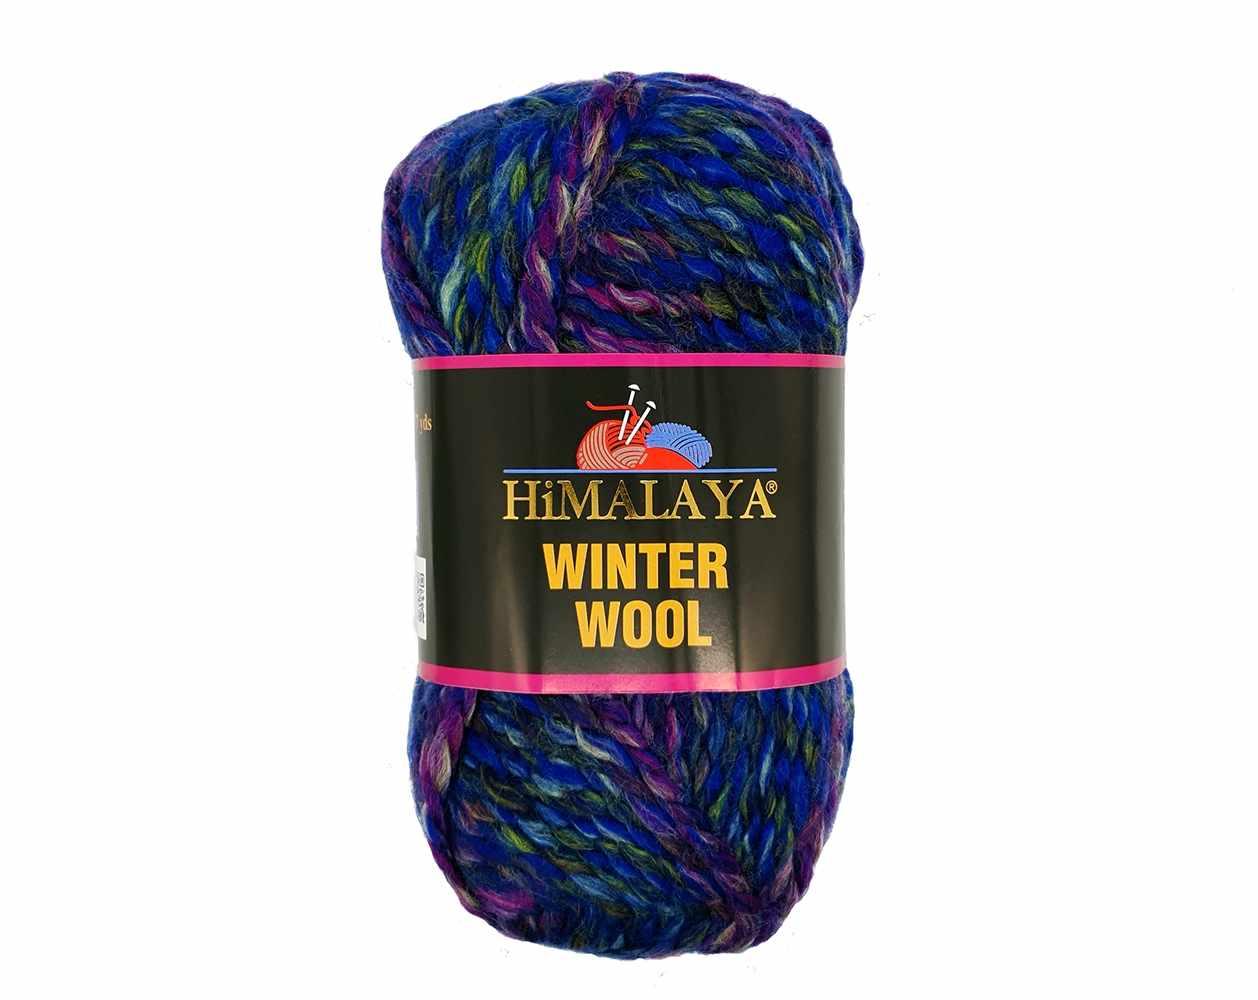 Пряжа Himalaya  Winter wool Цвет.11 сирен.бир.зелен.